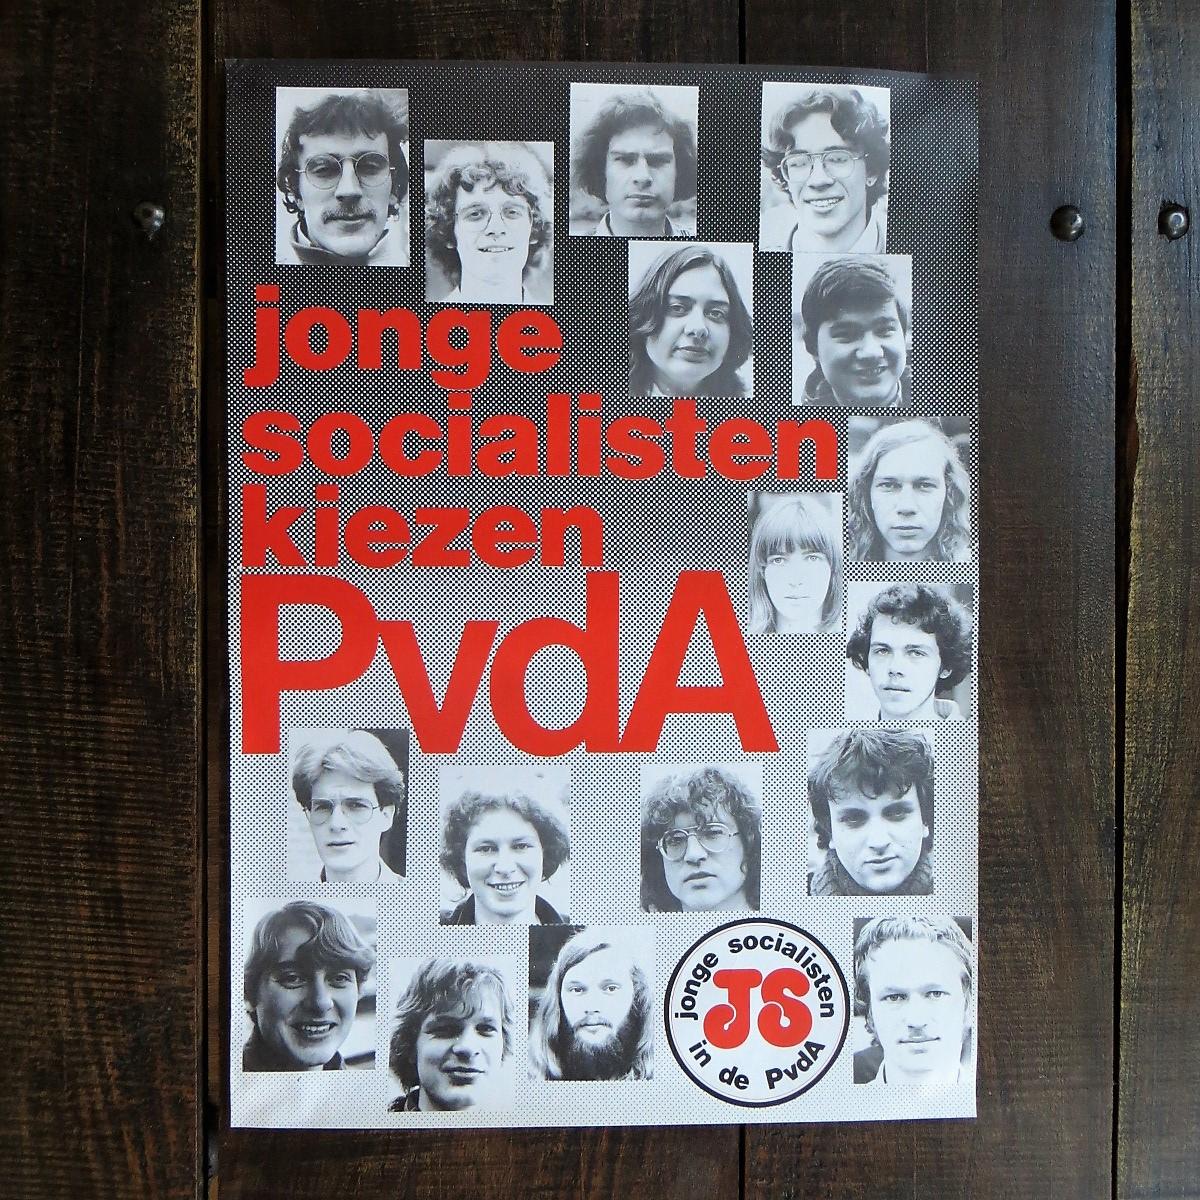 poster-pvda-jonge-socialisten-in-de-pvda-1